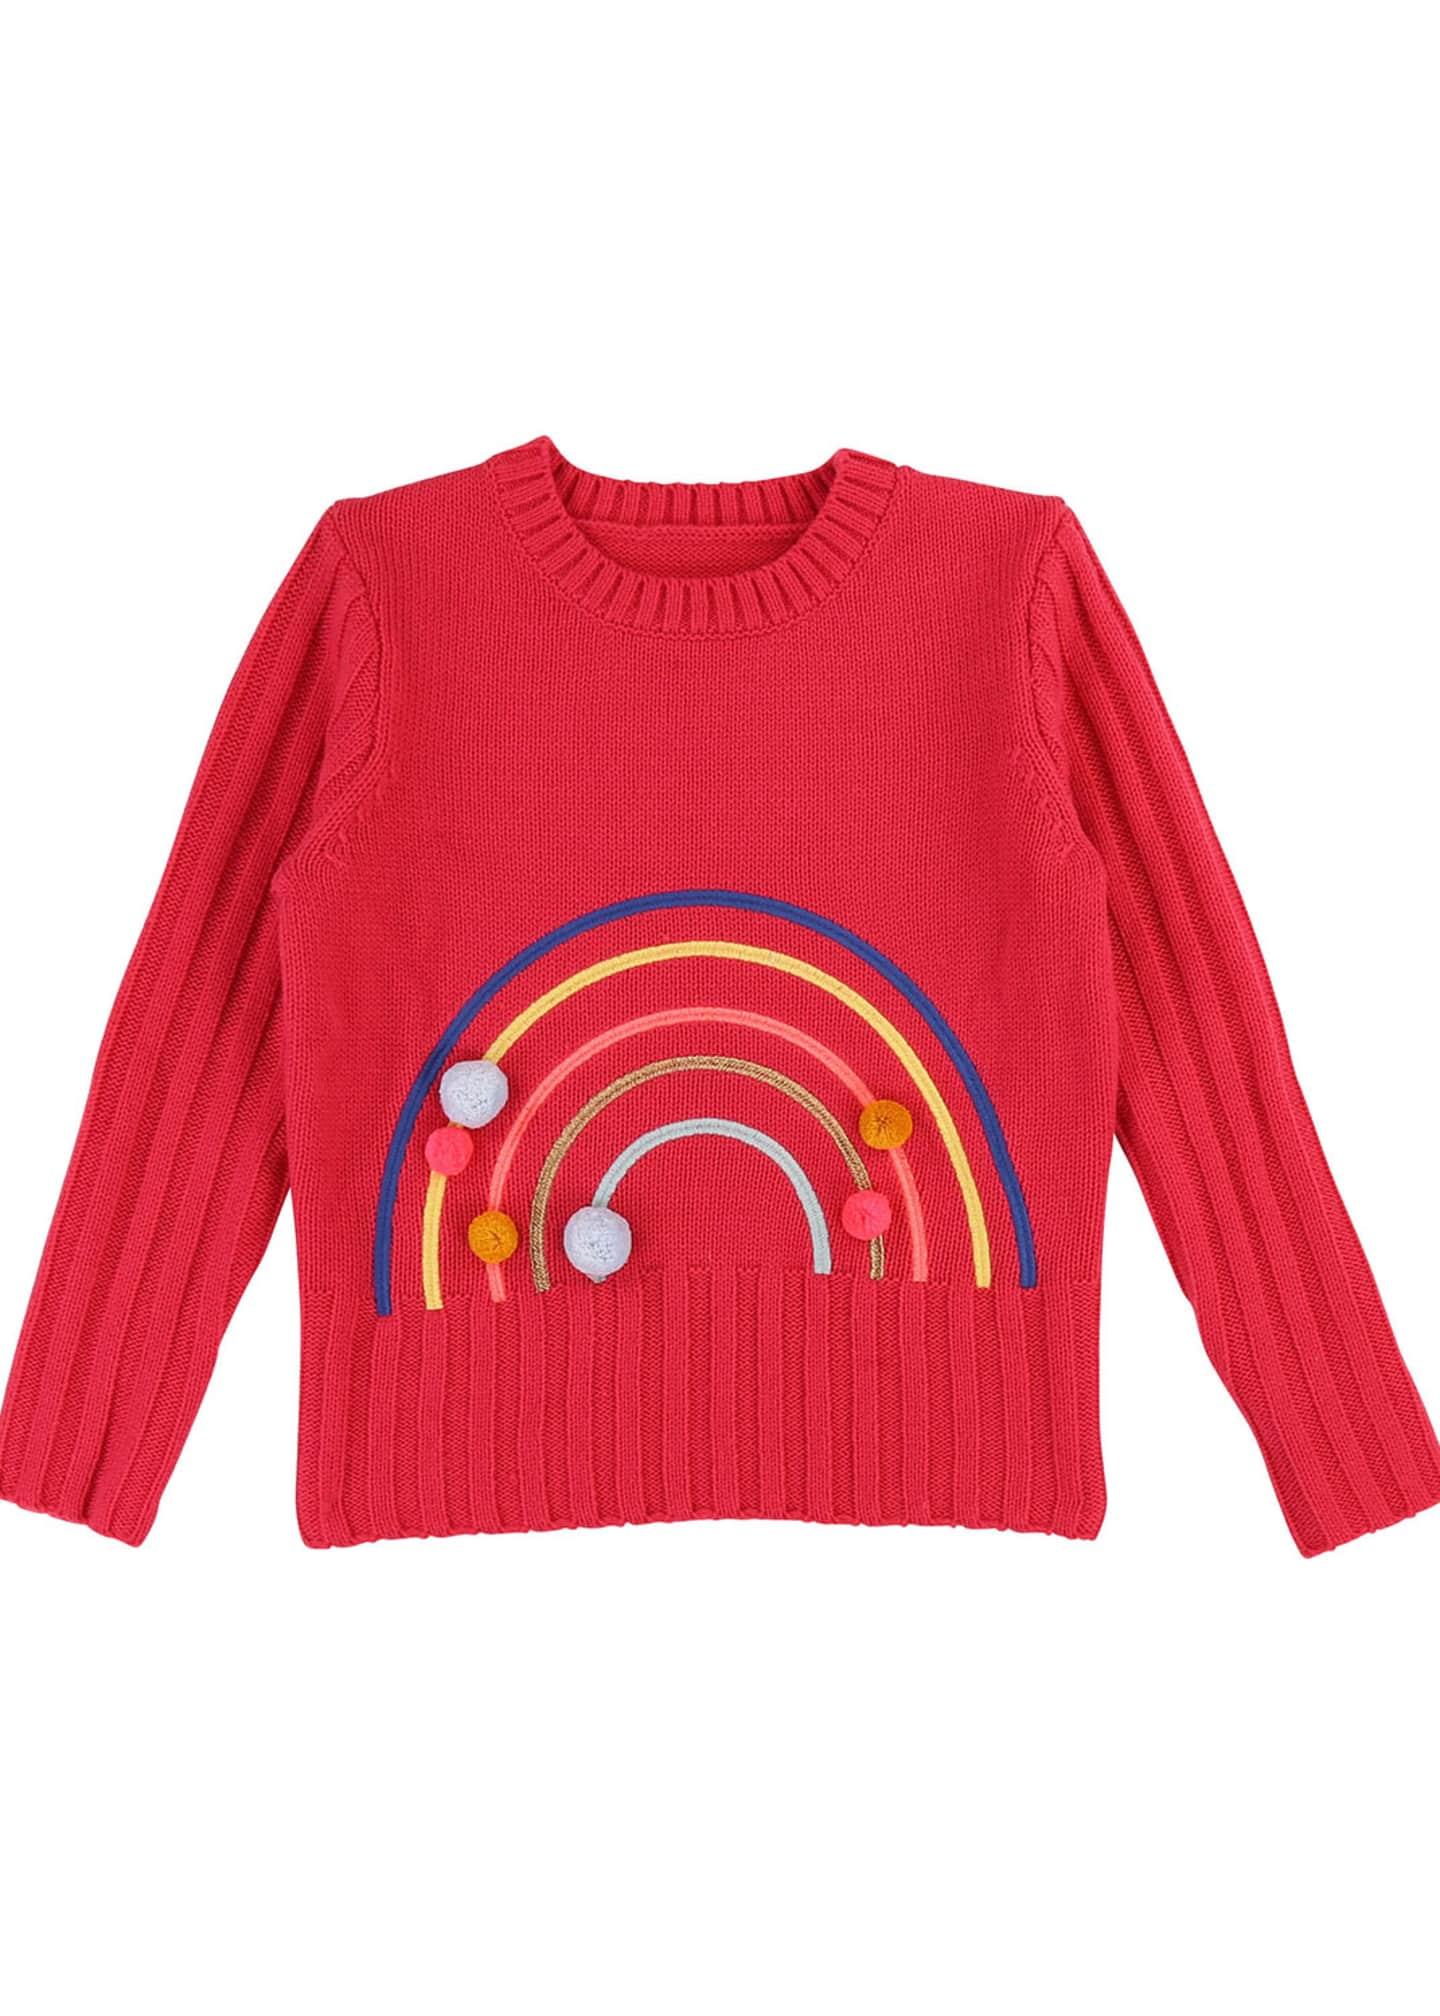 Billieblush Rainbow Sweater with Pompoms, Size 4-12